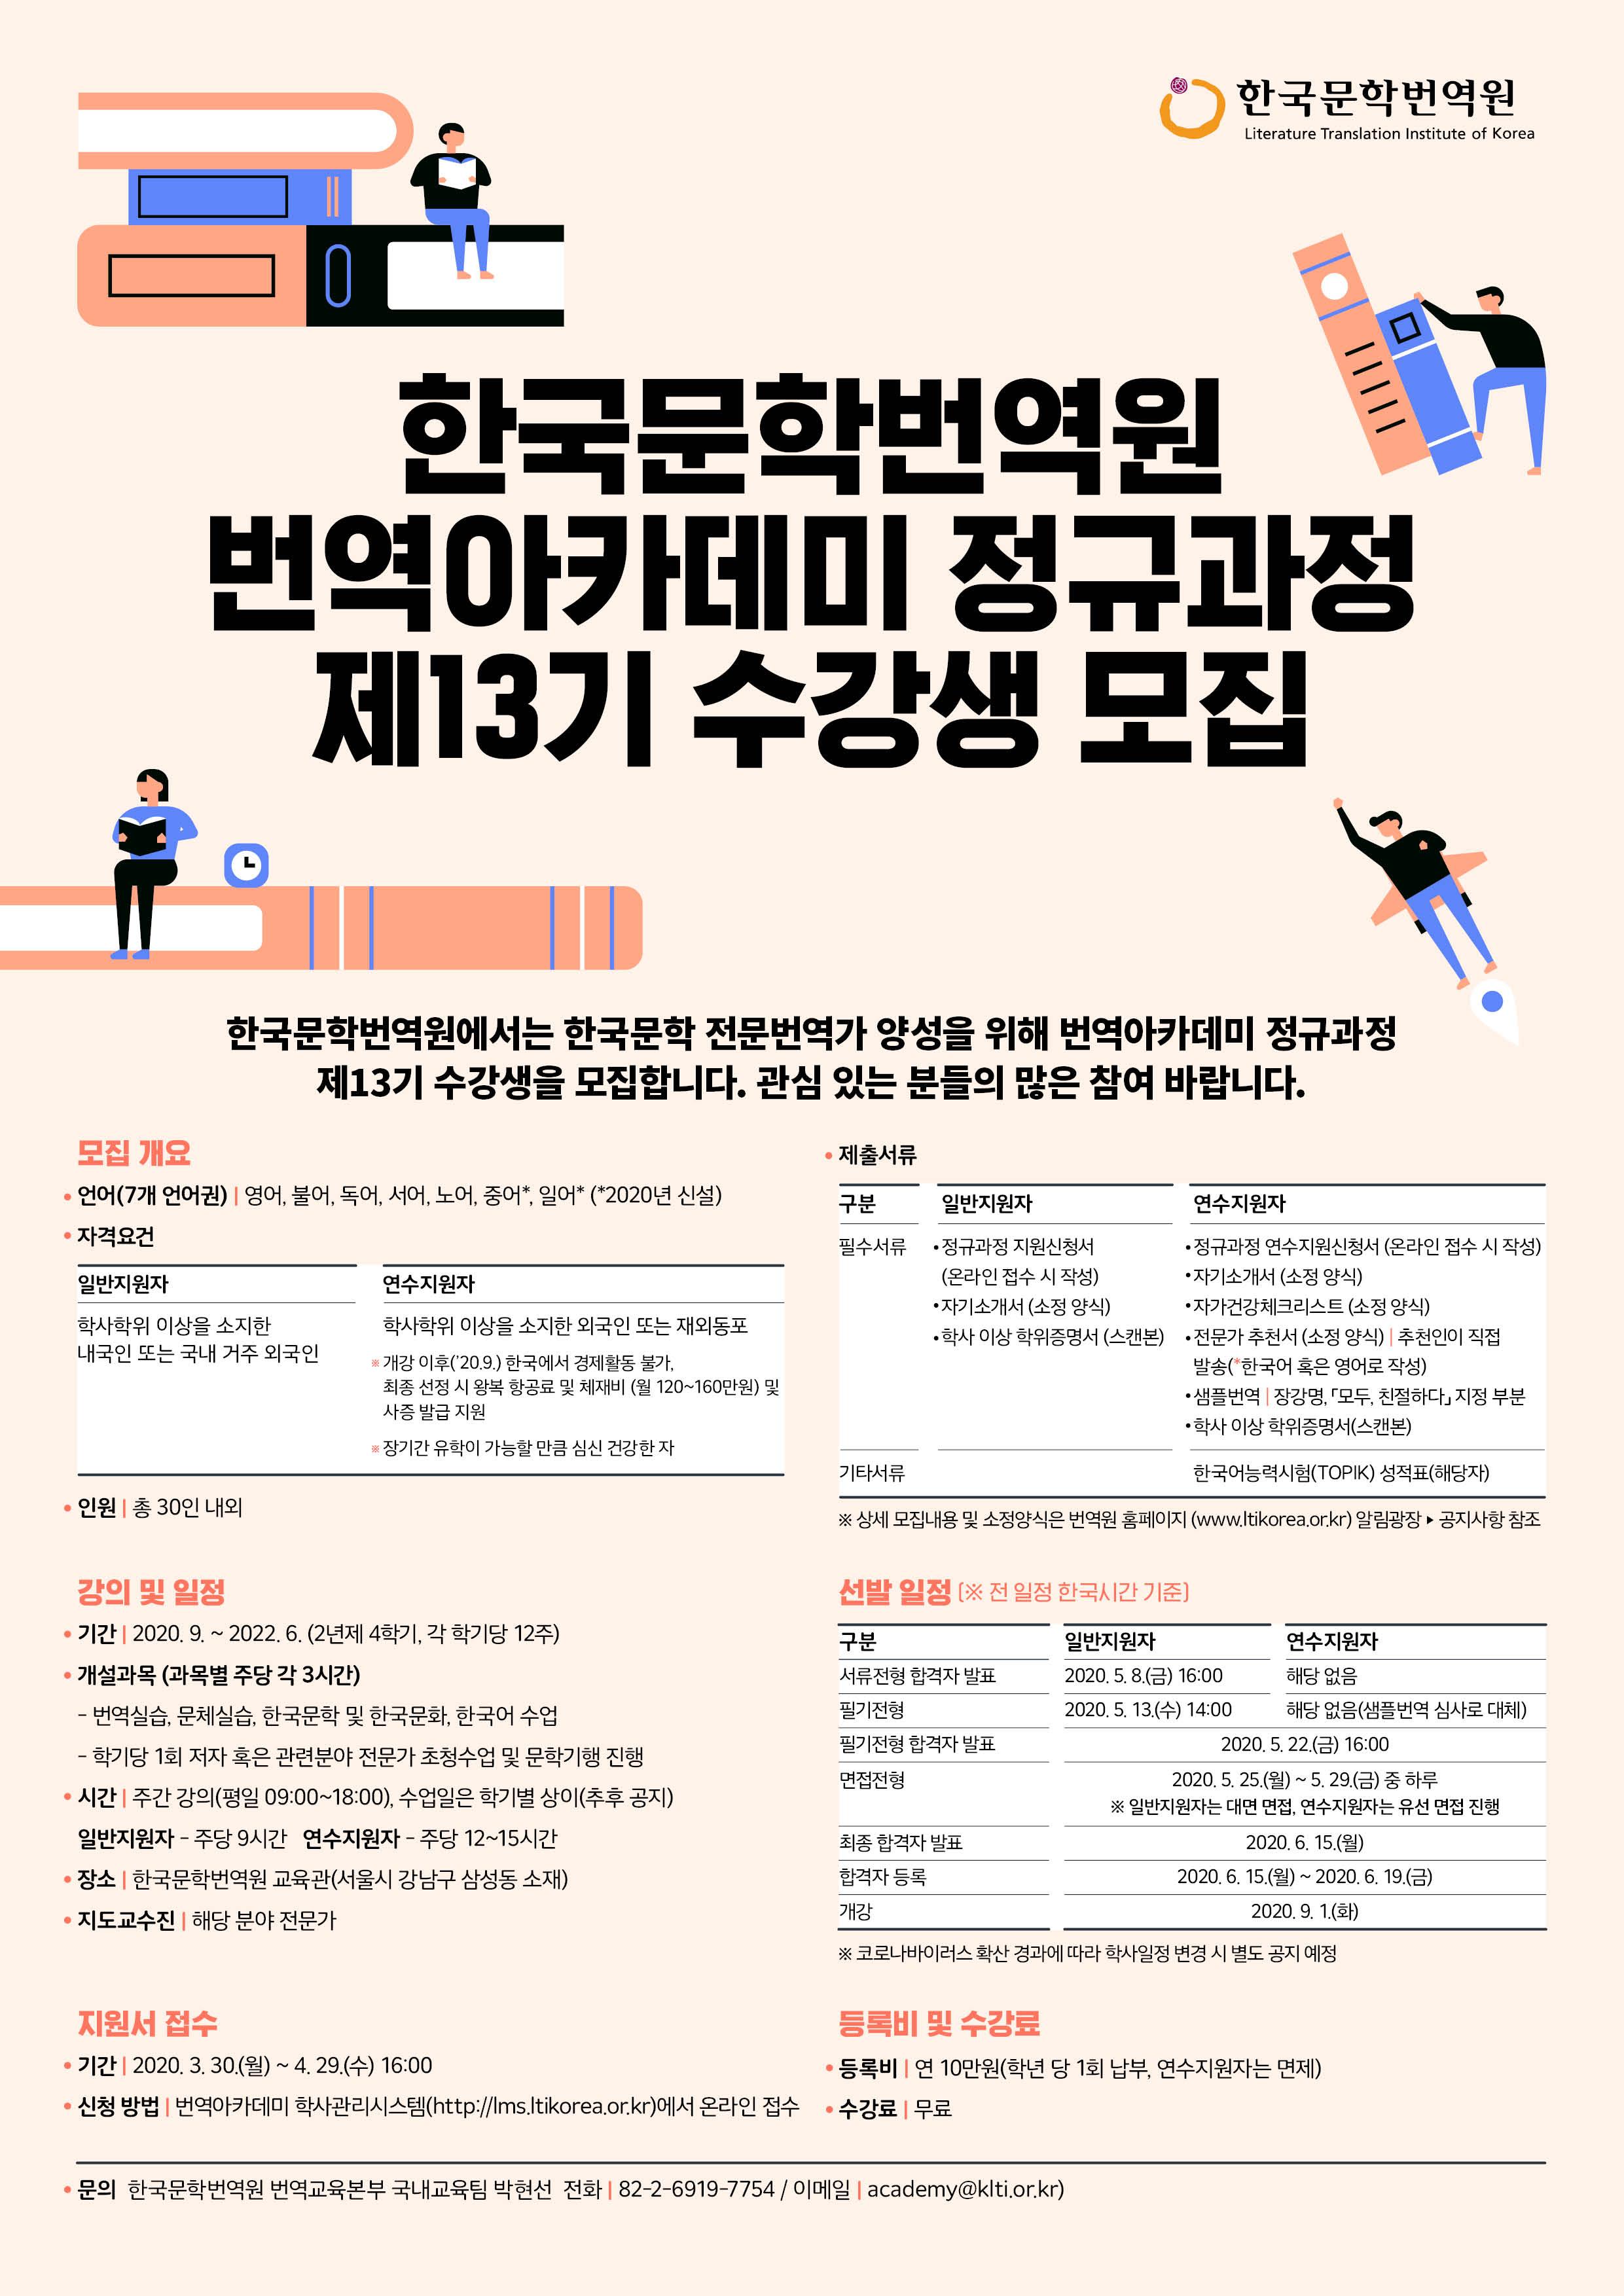 2-1. (Poster_KOR) 2020 번역아카데미 정규과정 제13기 수강생 모집.jpg